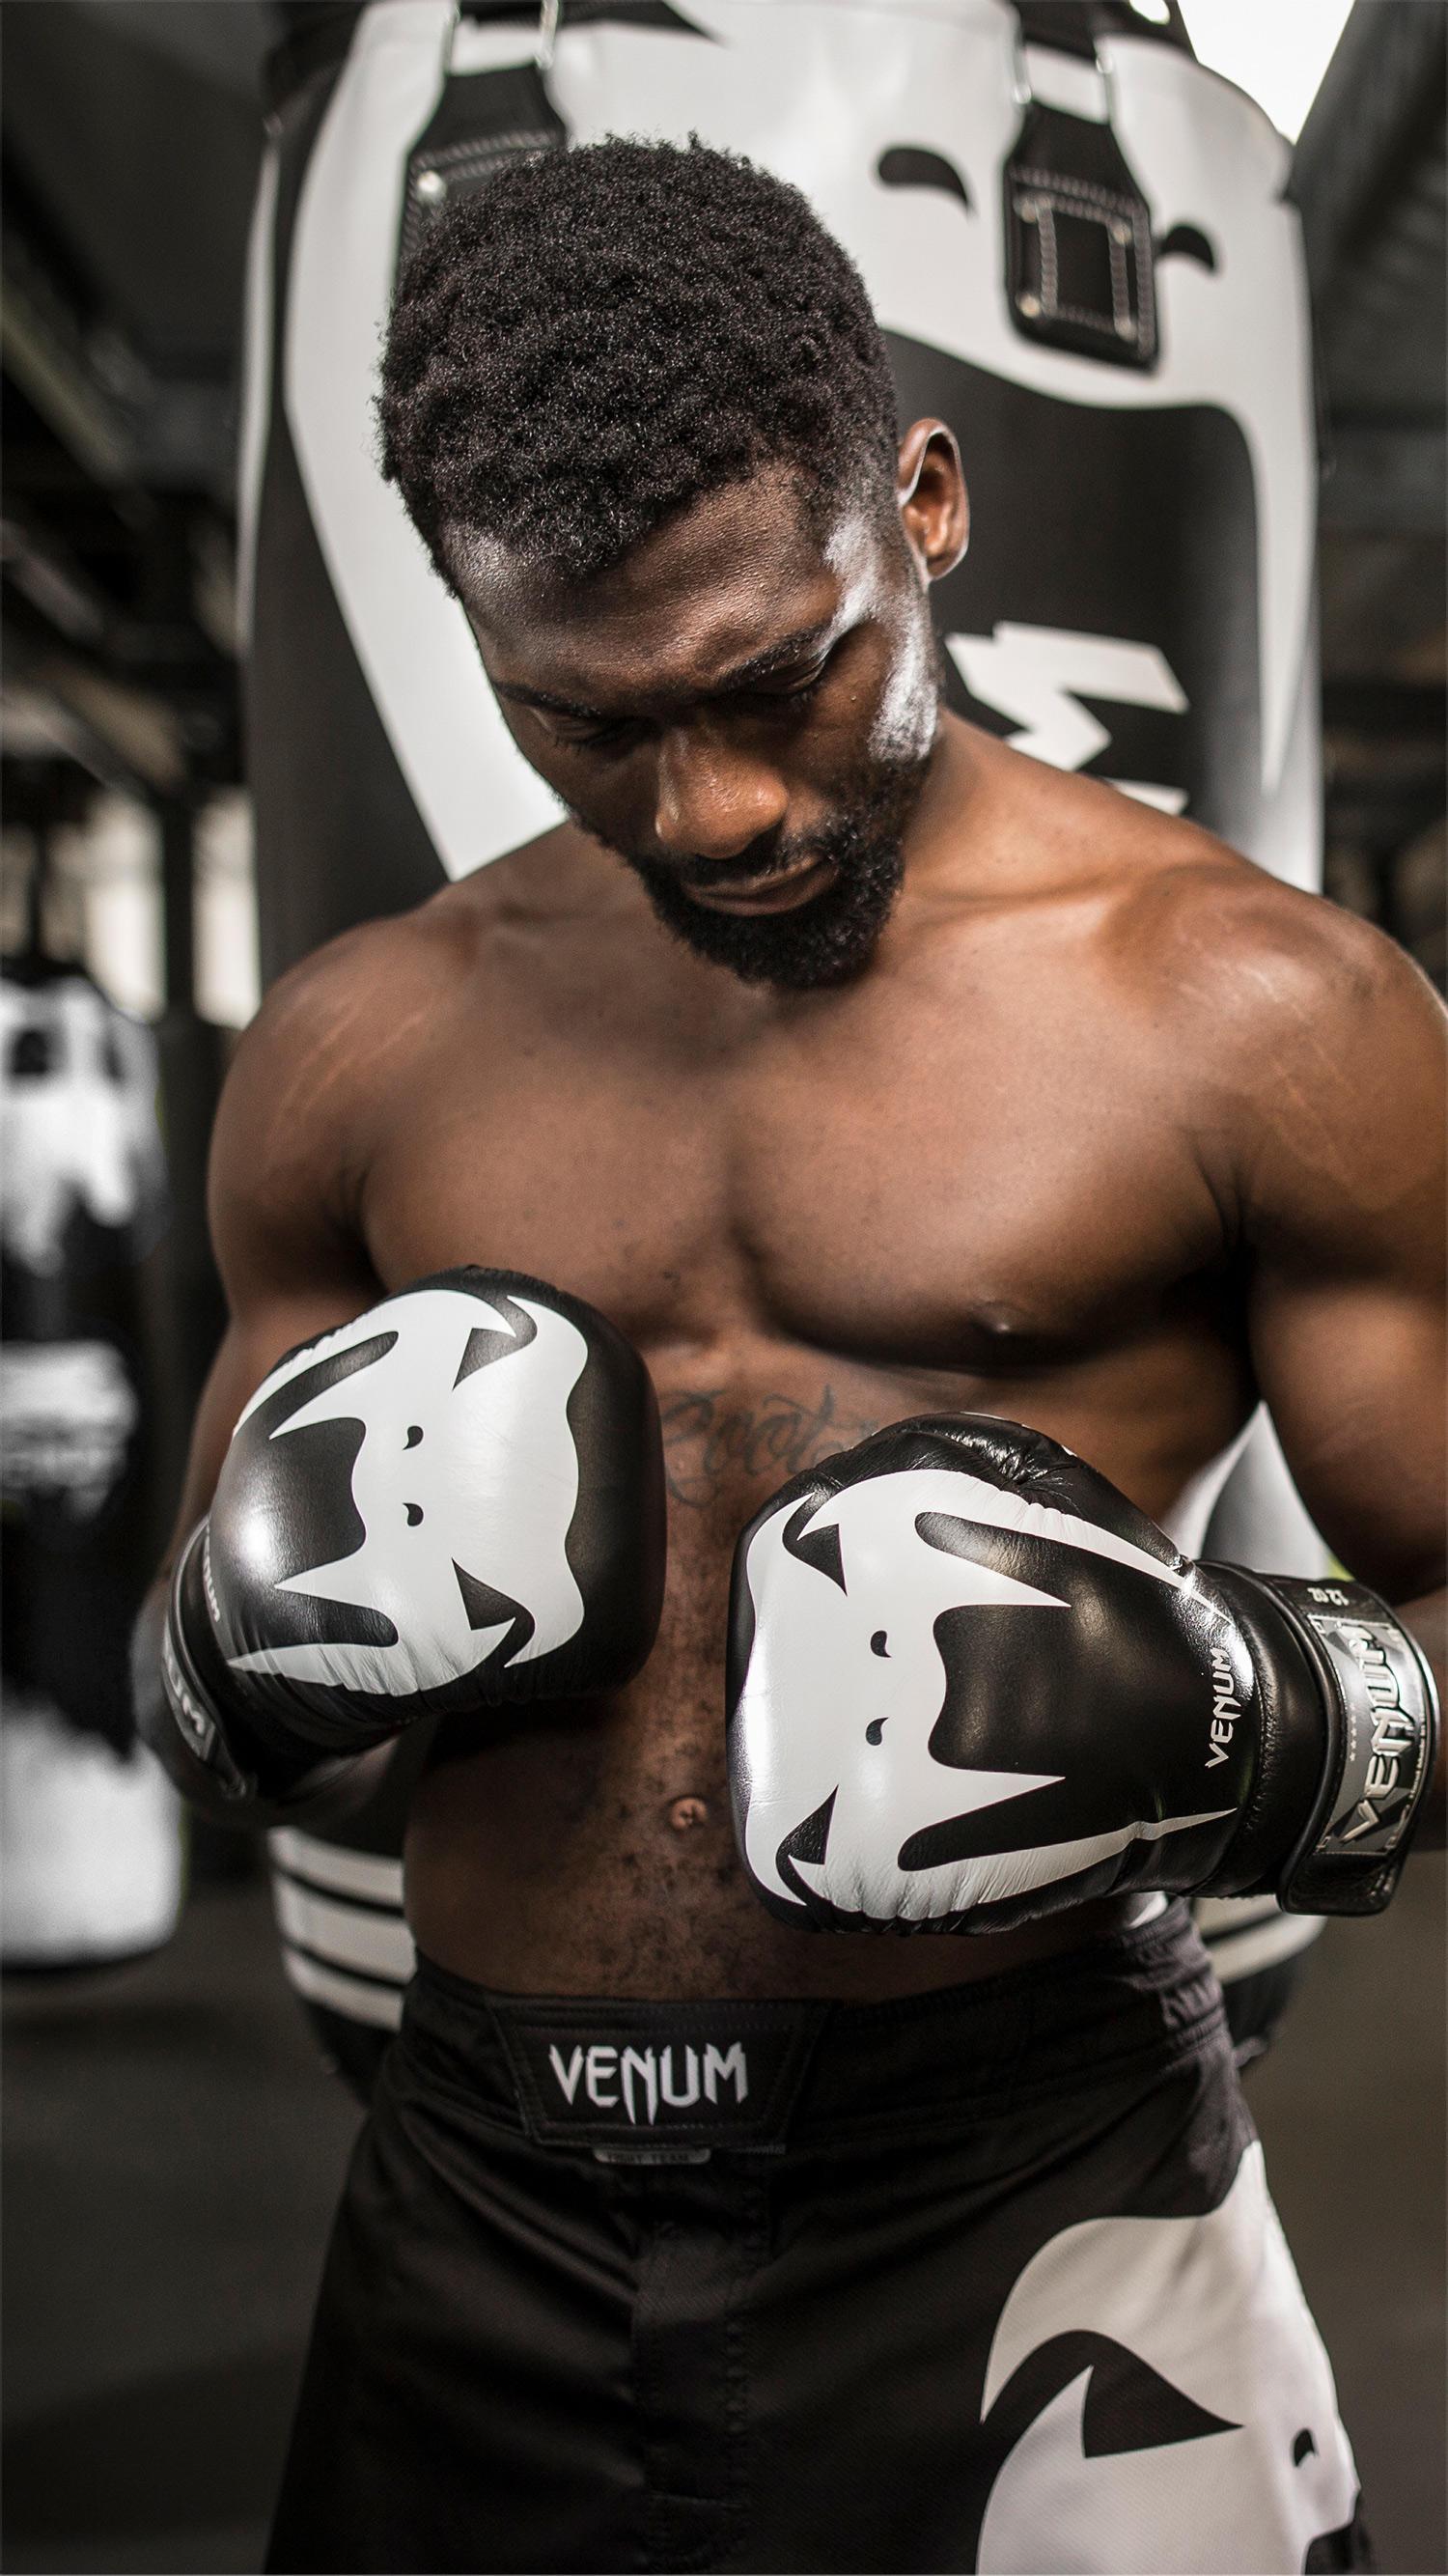 FightPro MMA Shorts MMA, Jiu Jitsu, Boxing, Muah Thai, almost any sport